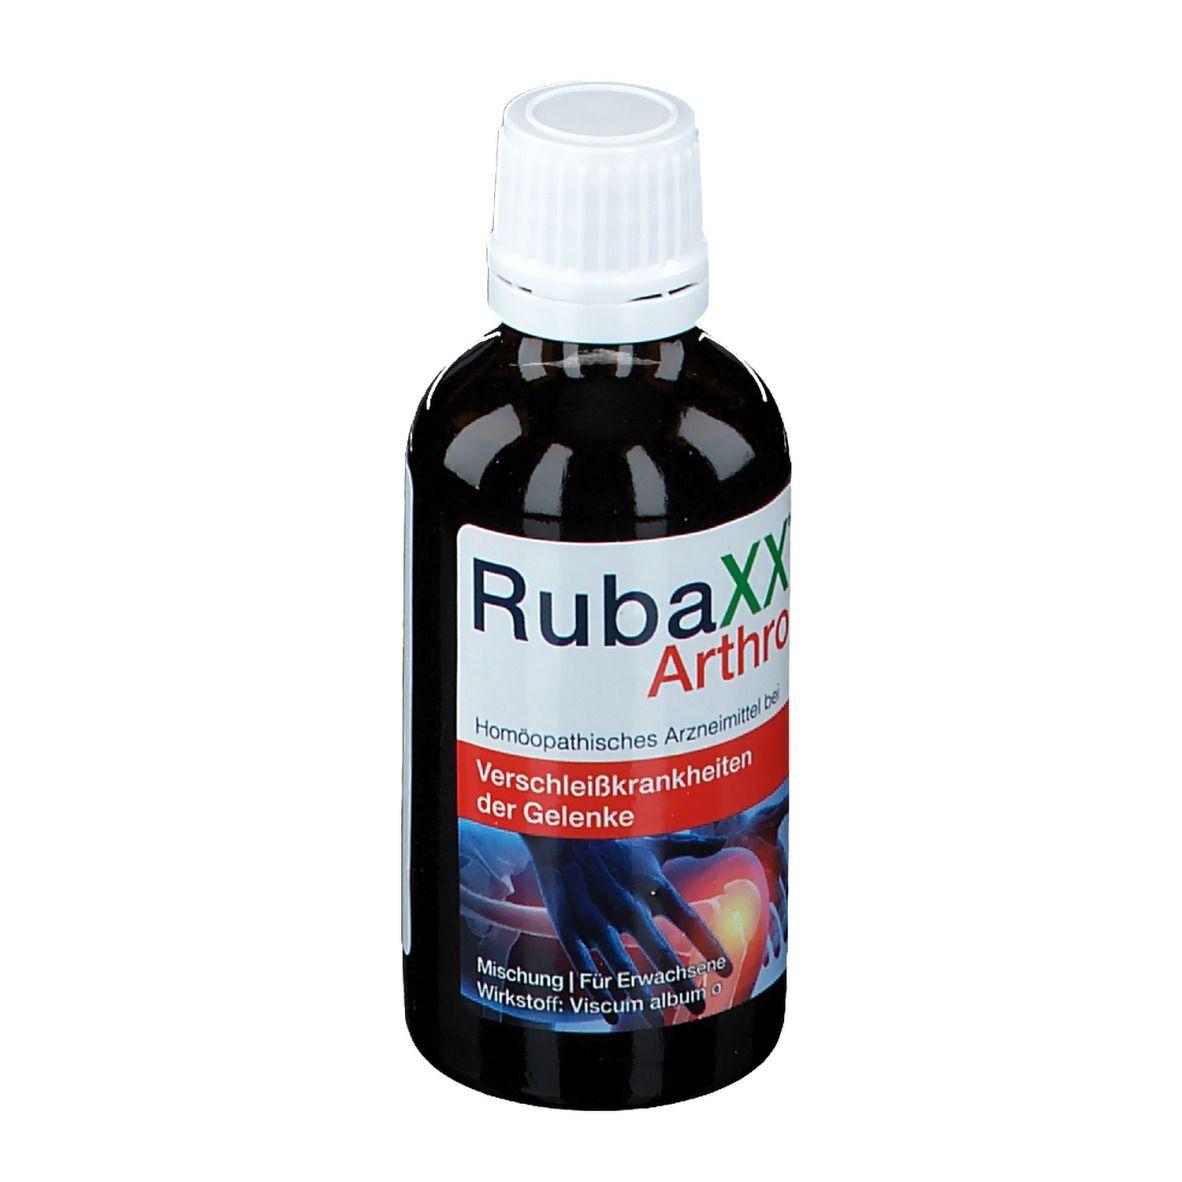 RubaXX® Arthro